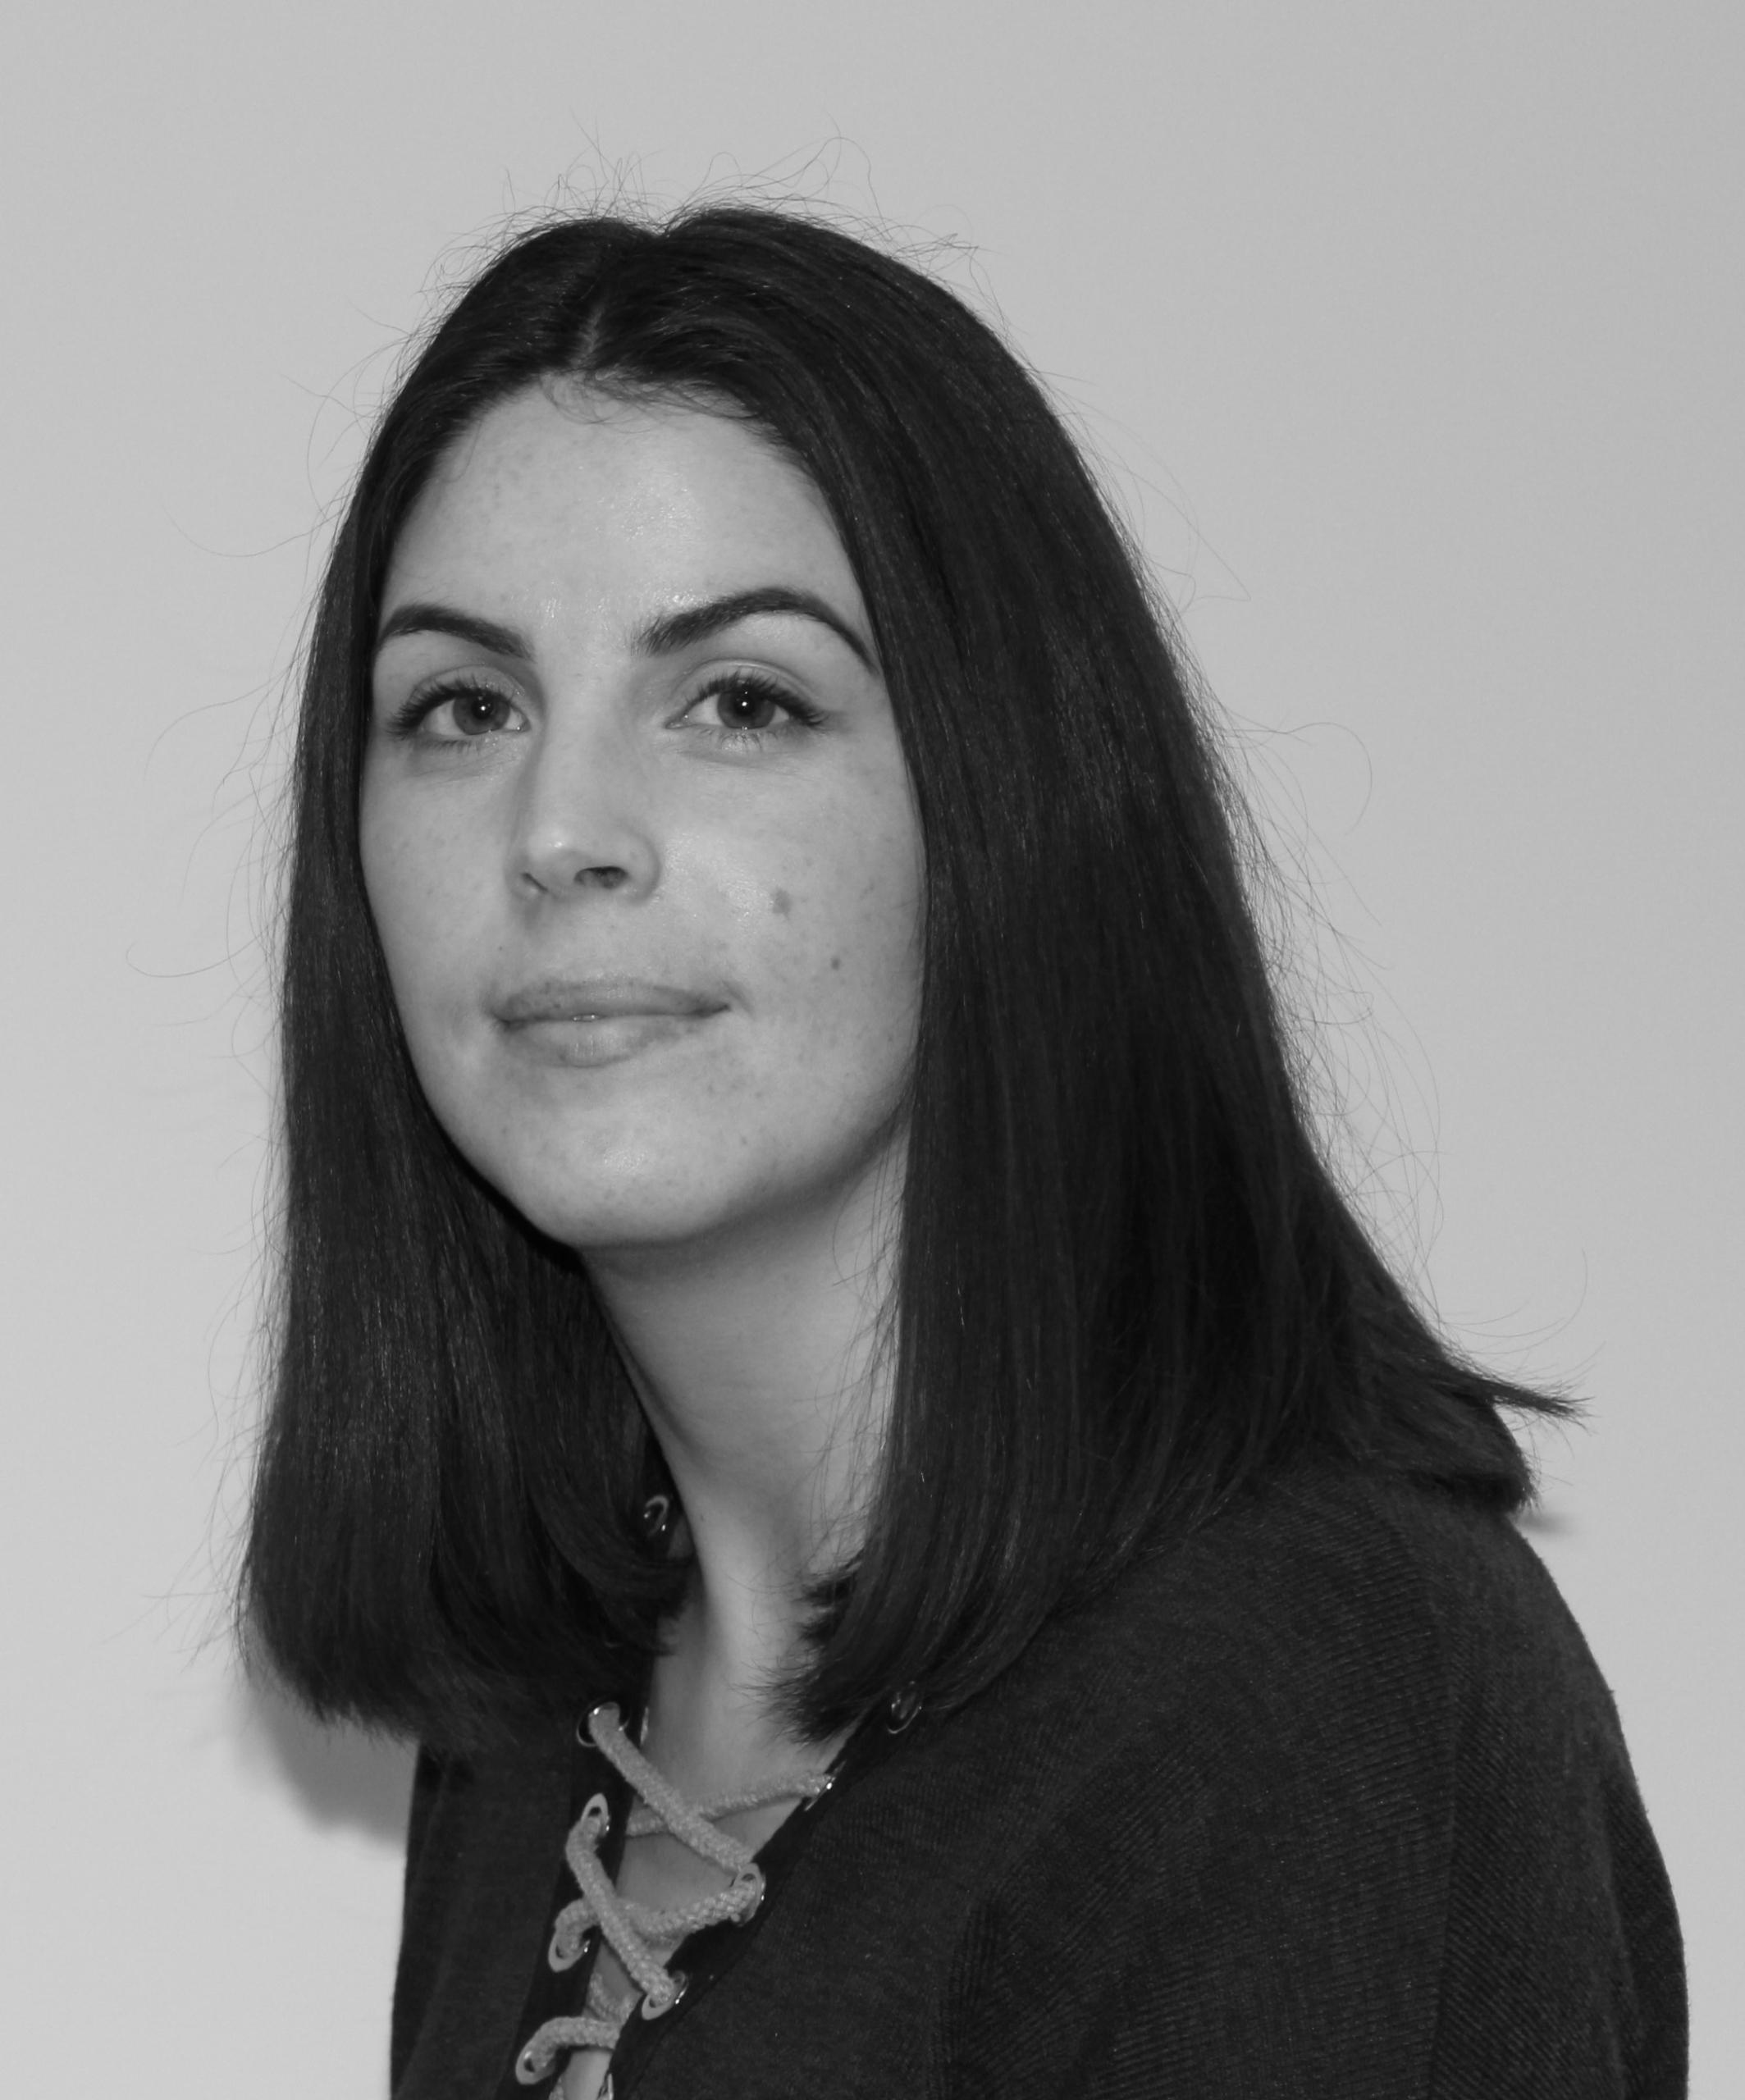 Maria Mangare